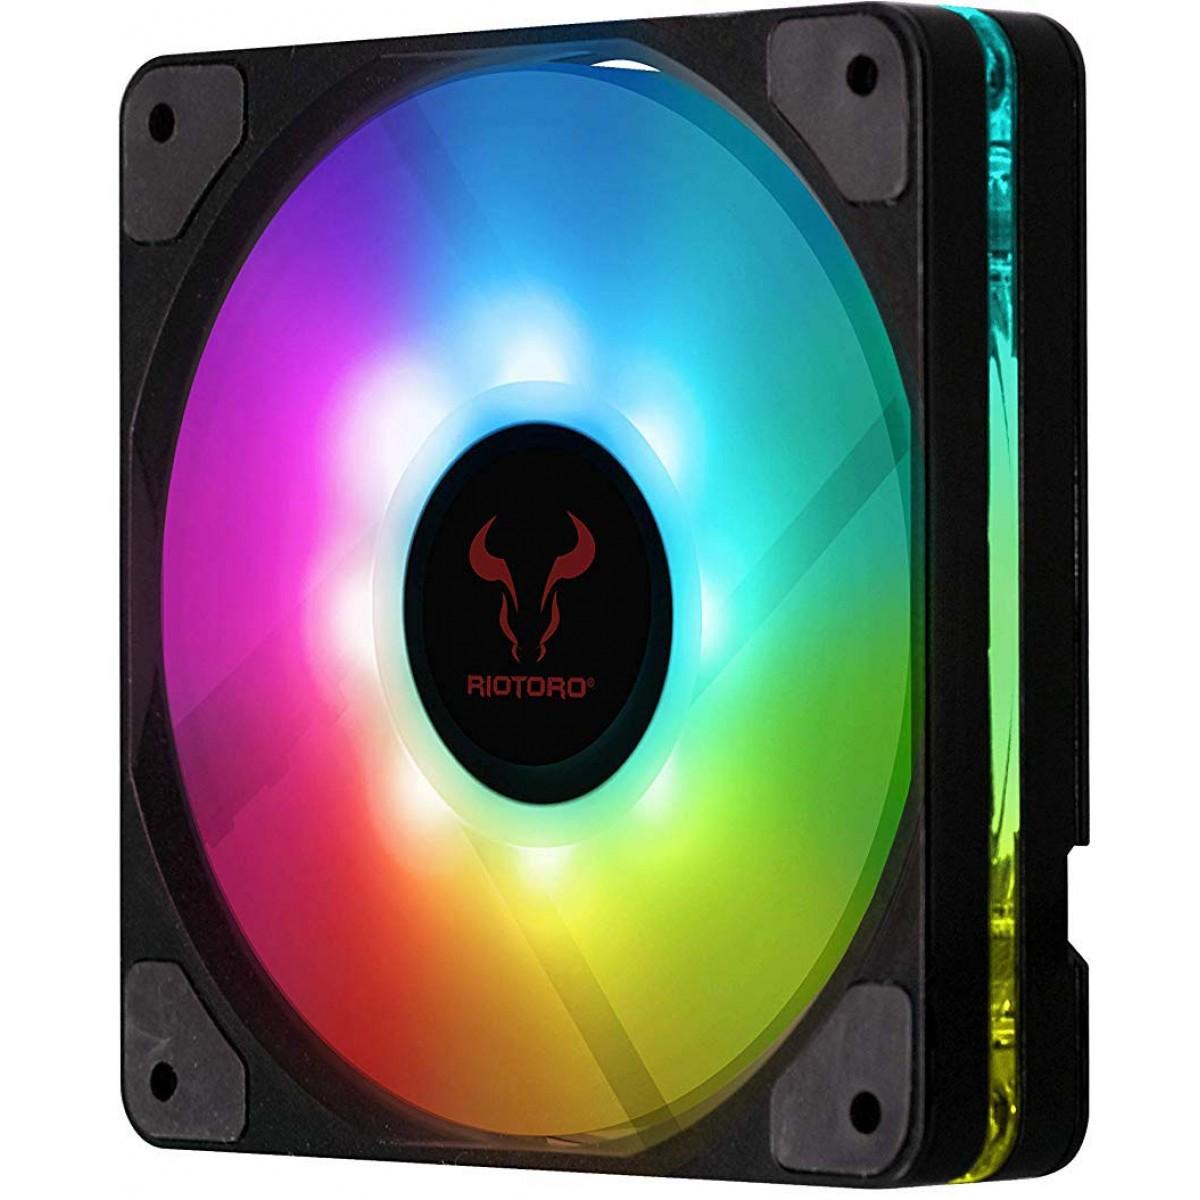 Kit Fan com 3 Unidades Riotoro Quiet Storm, LED RGB 120mm, FRGB120-QS168X